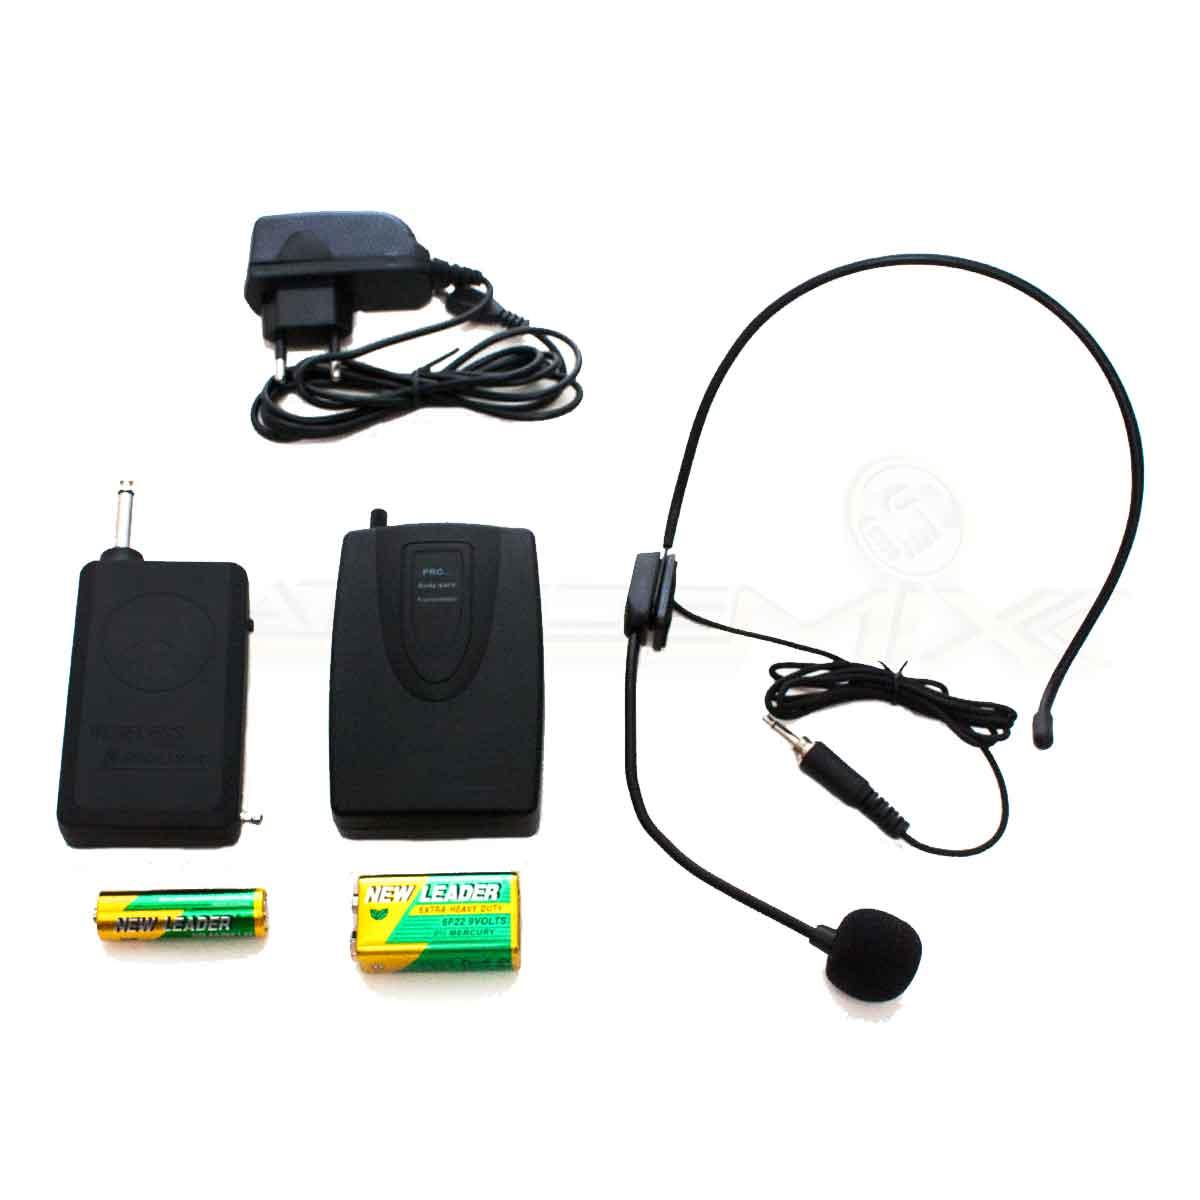 Microfone Sem Fio Lapela Headset Profissional 30-50 mts